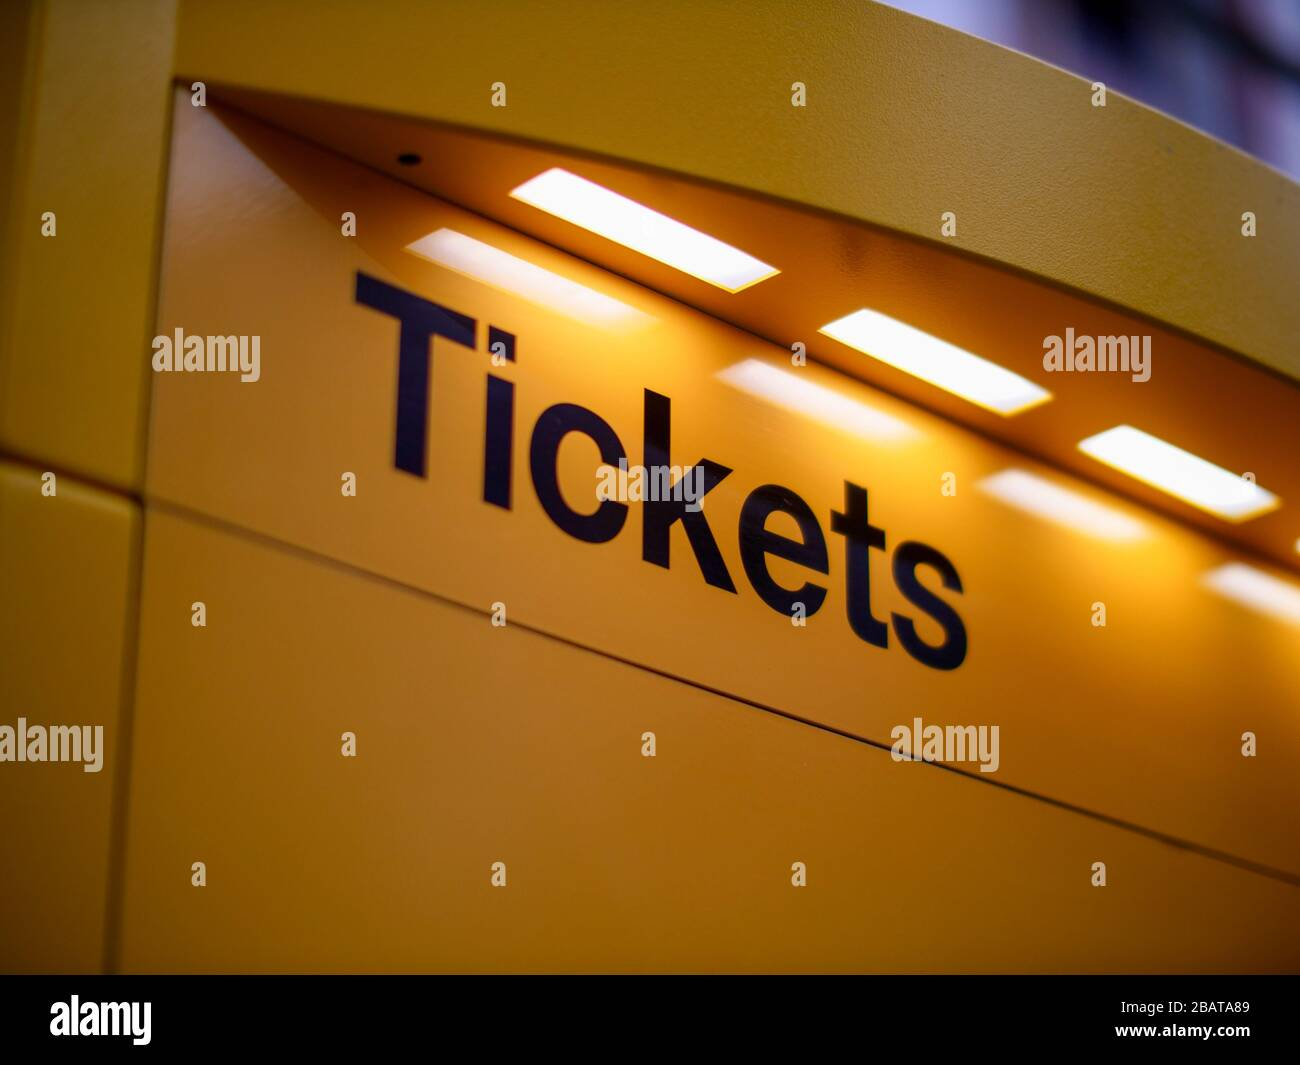 Fahrkarten Automat für Tickets ÖPNV Fahrkartenautomat Stock Photo